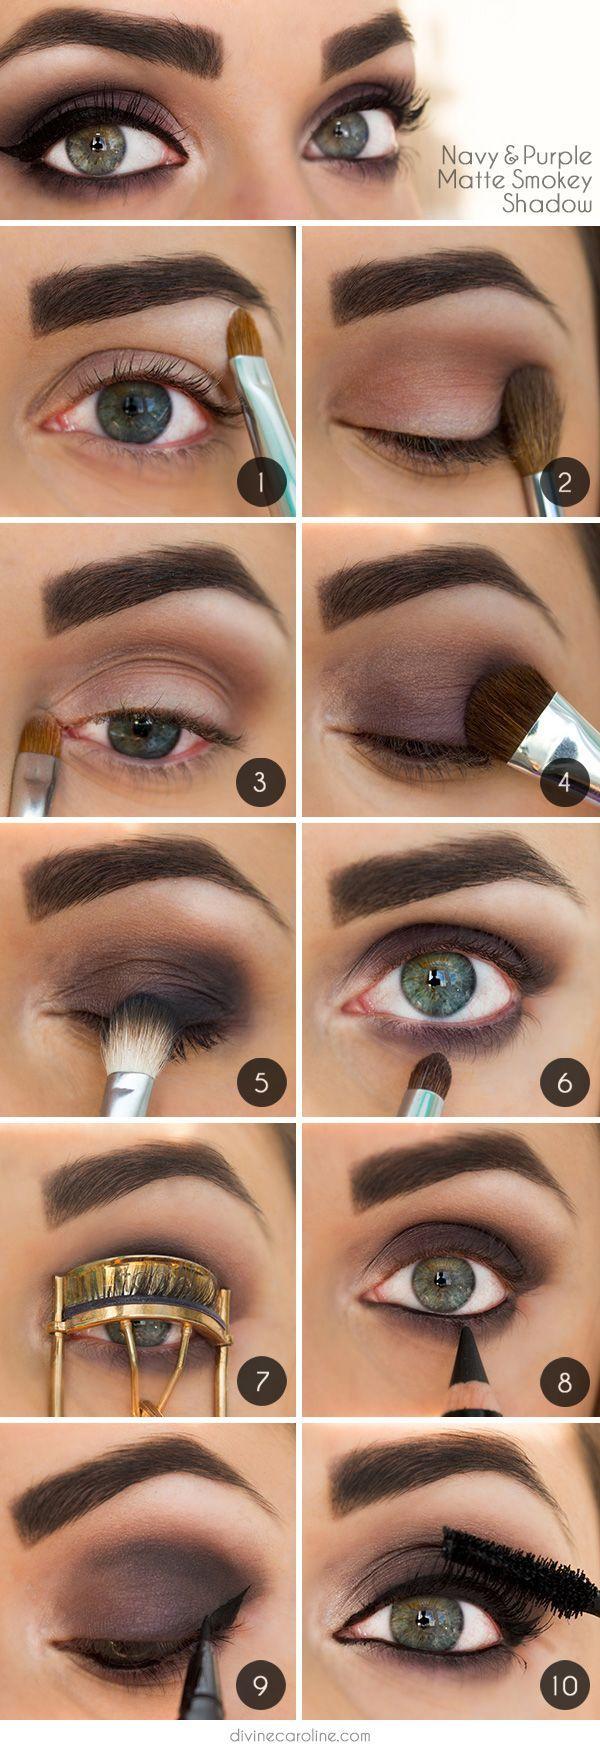 best makeup images on pinterest beauty makeup maquiagem and